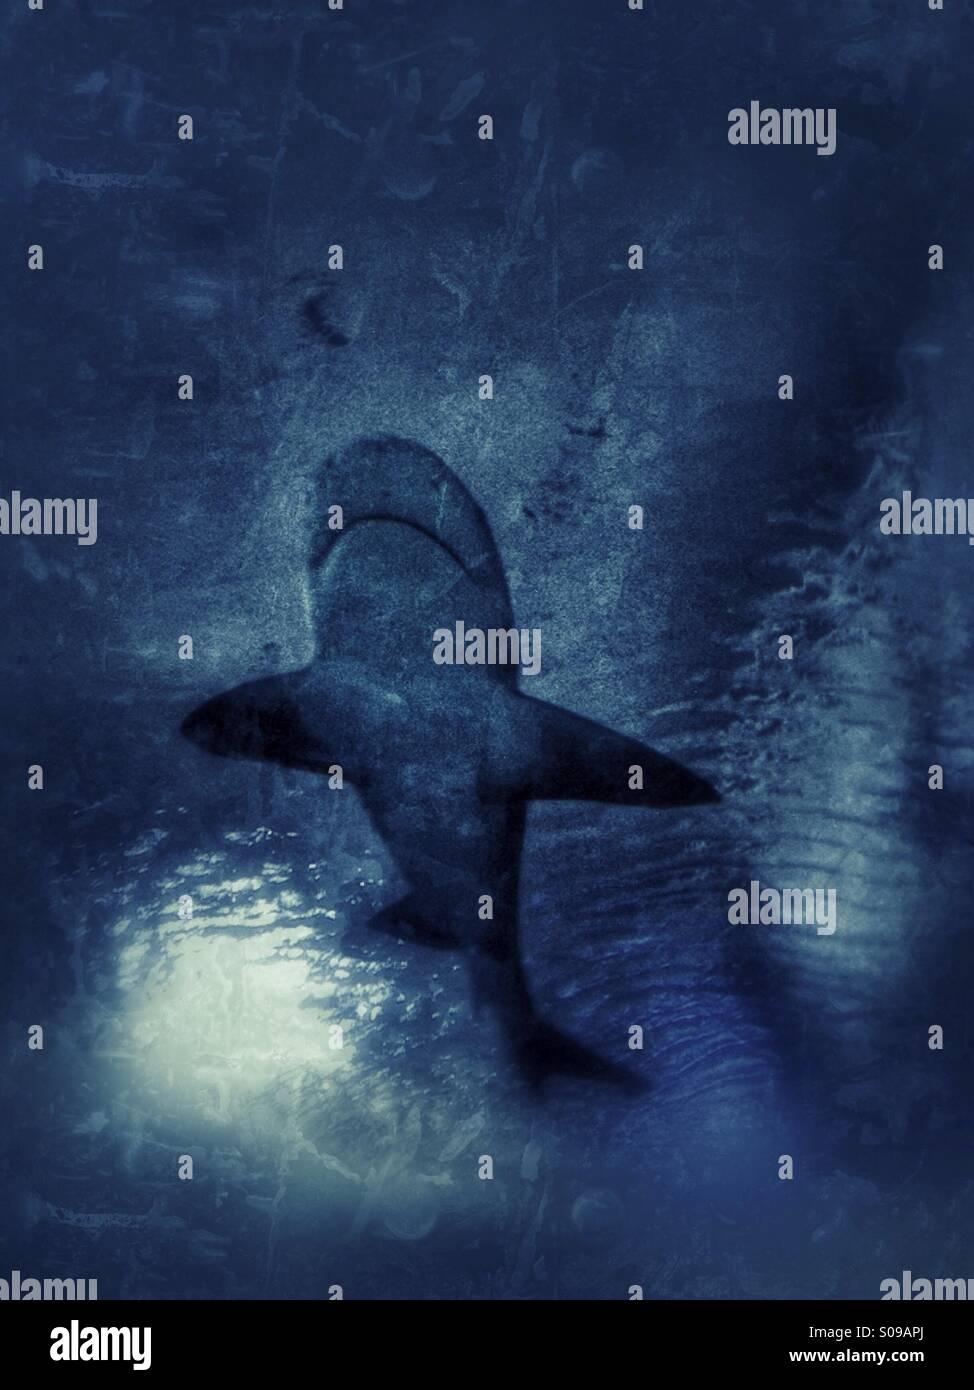 Shark Imagen De Stock